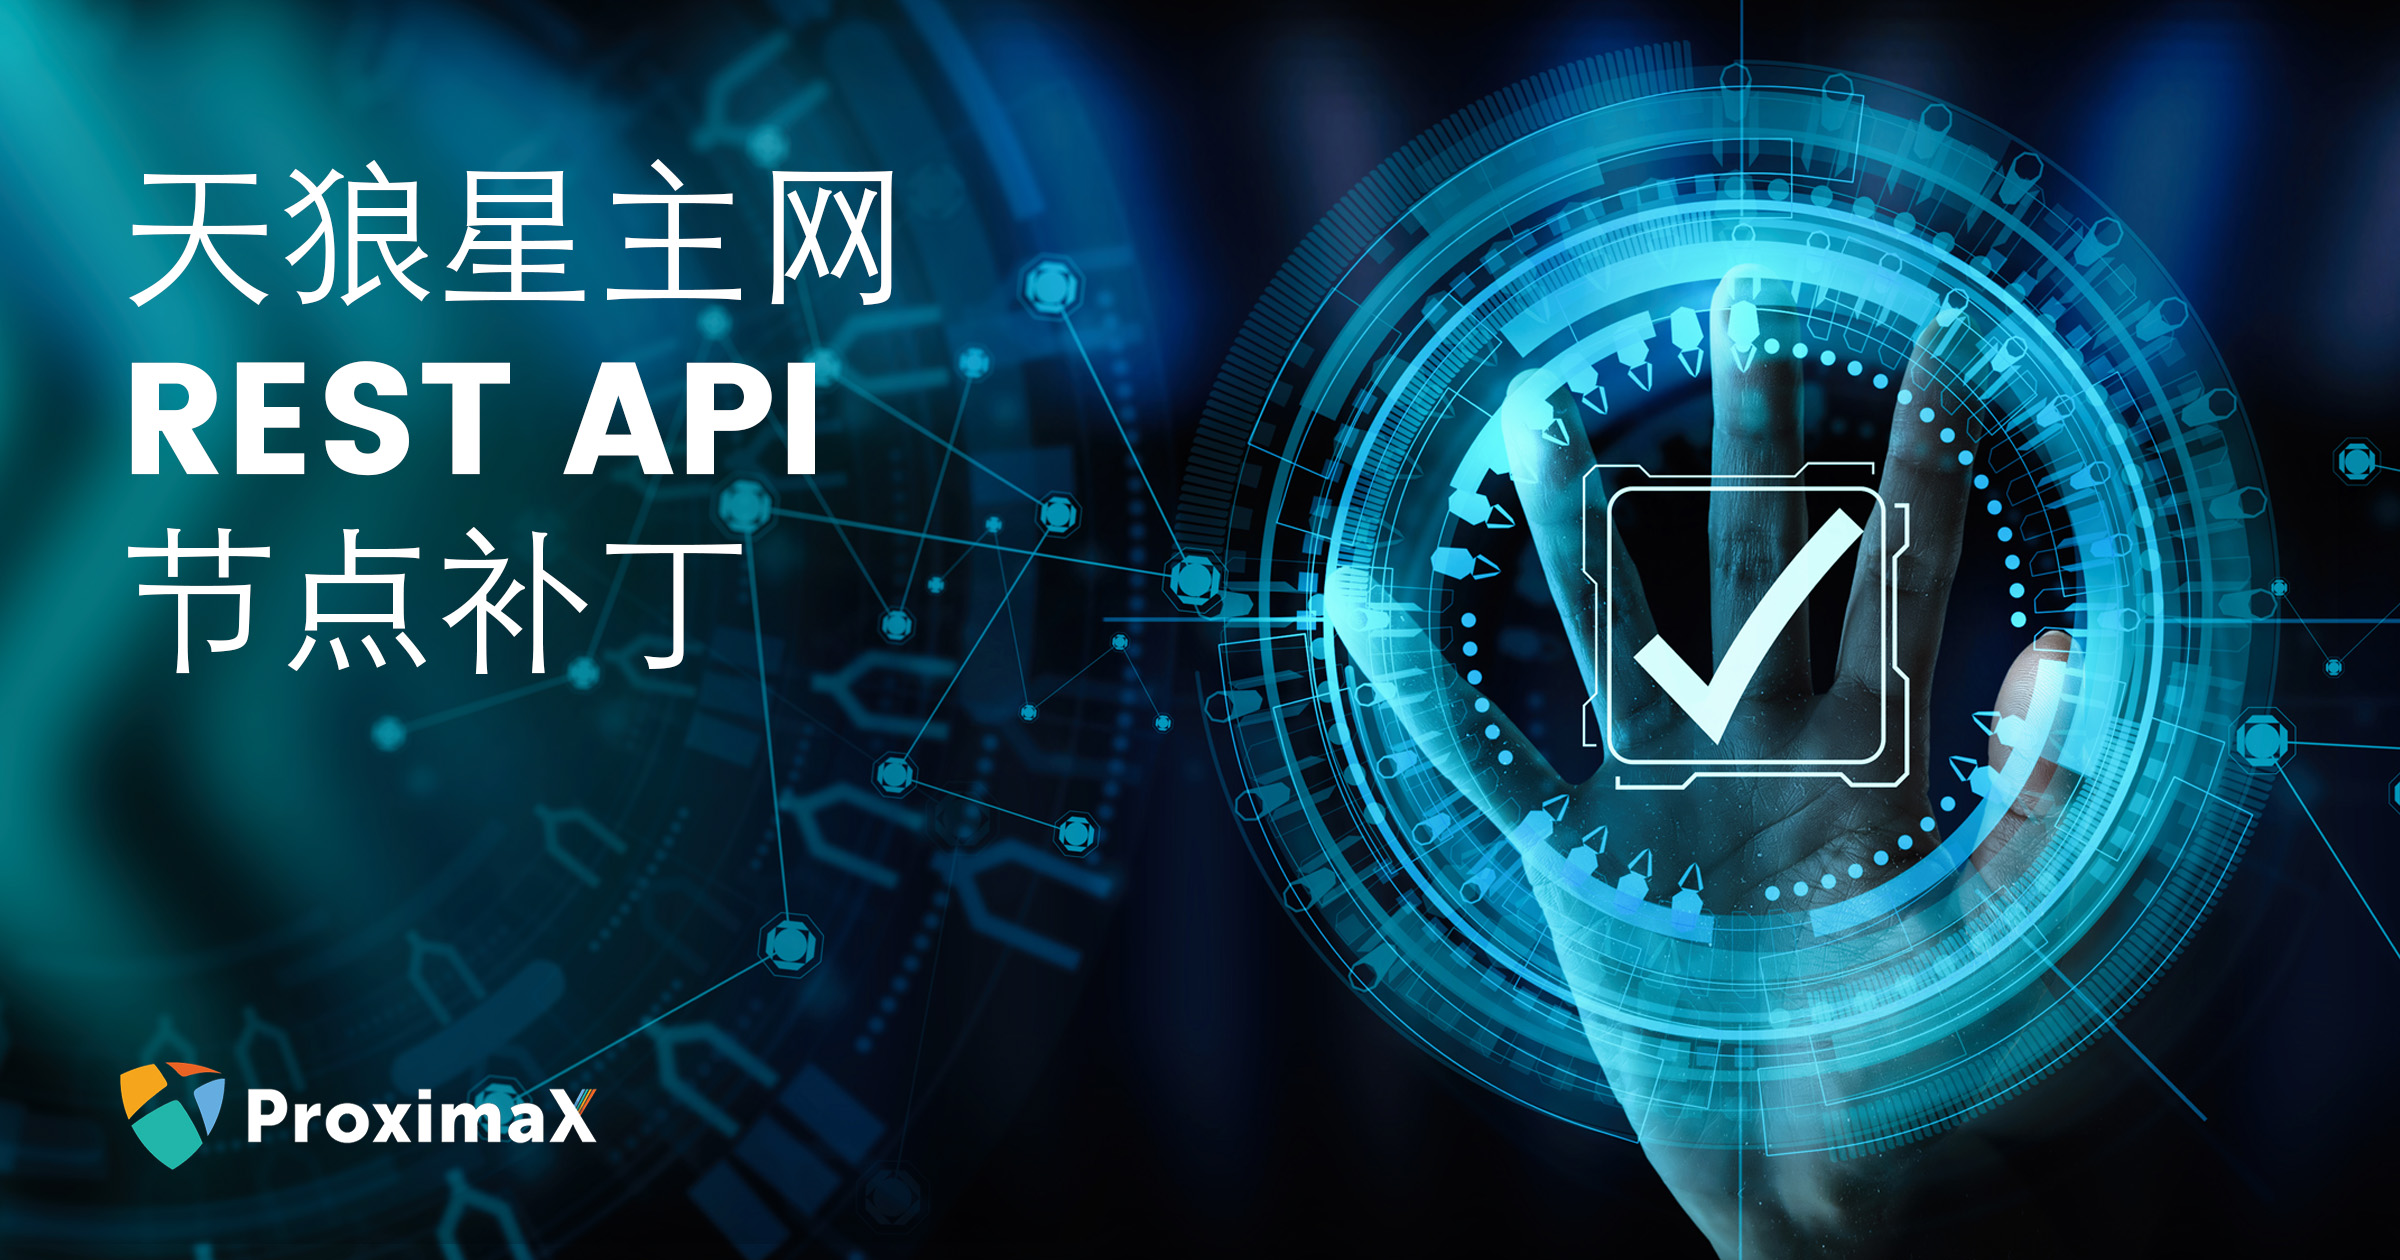 ProximaX天狼星链公网(主网)- REST API节点补丁